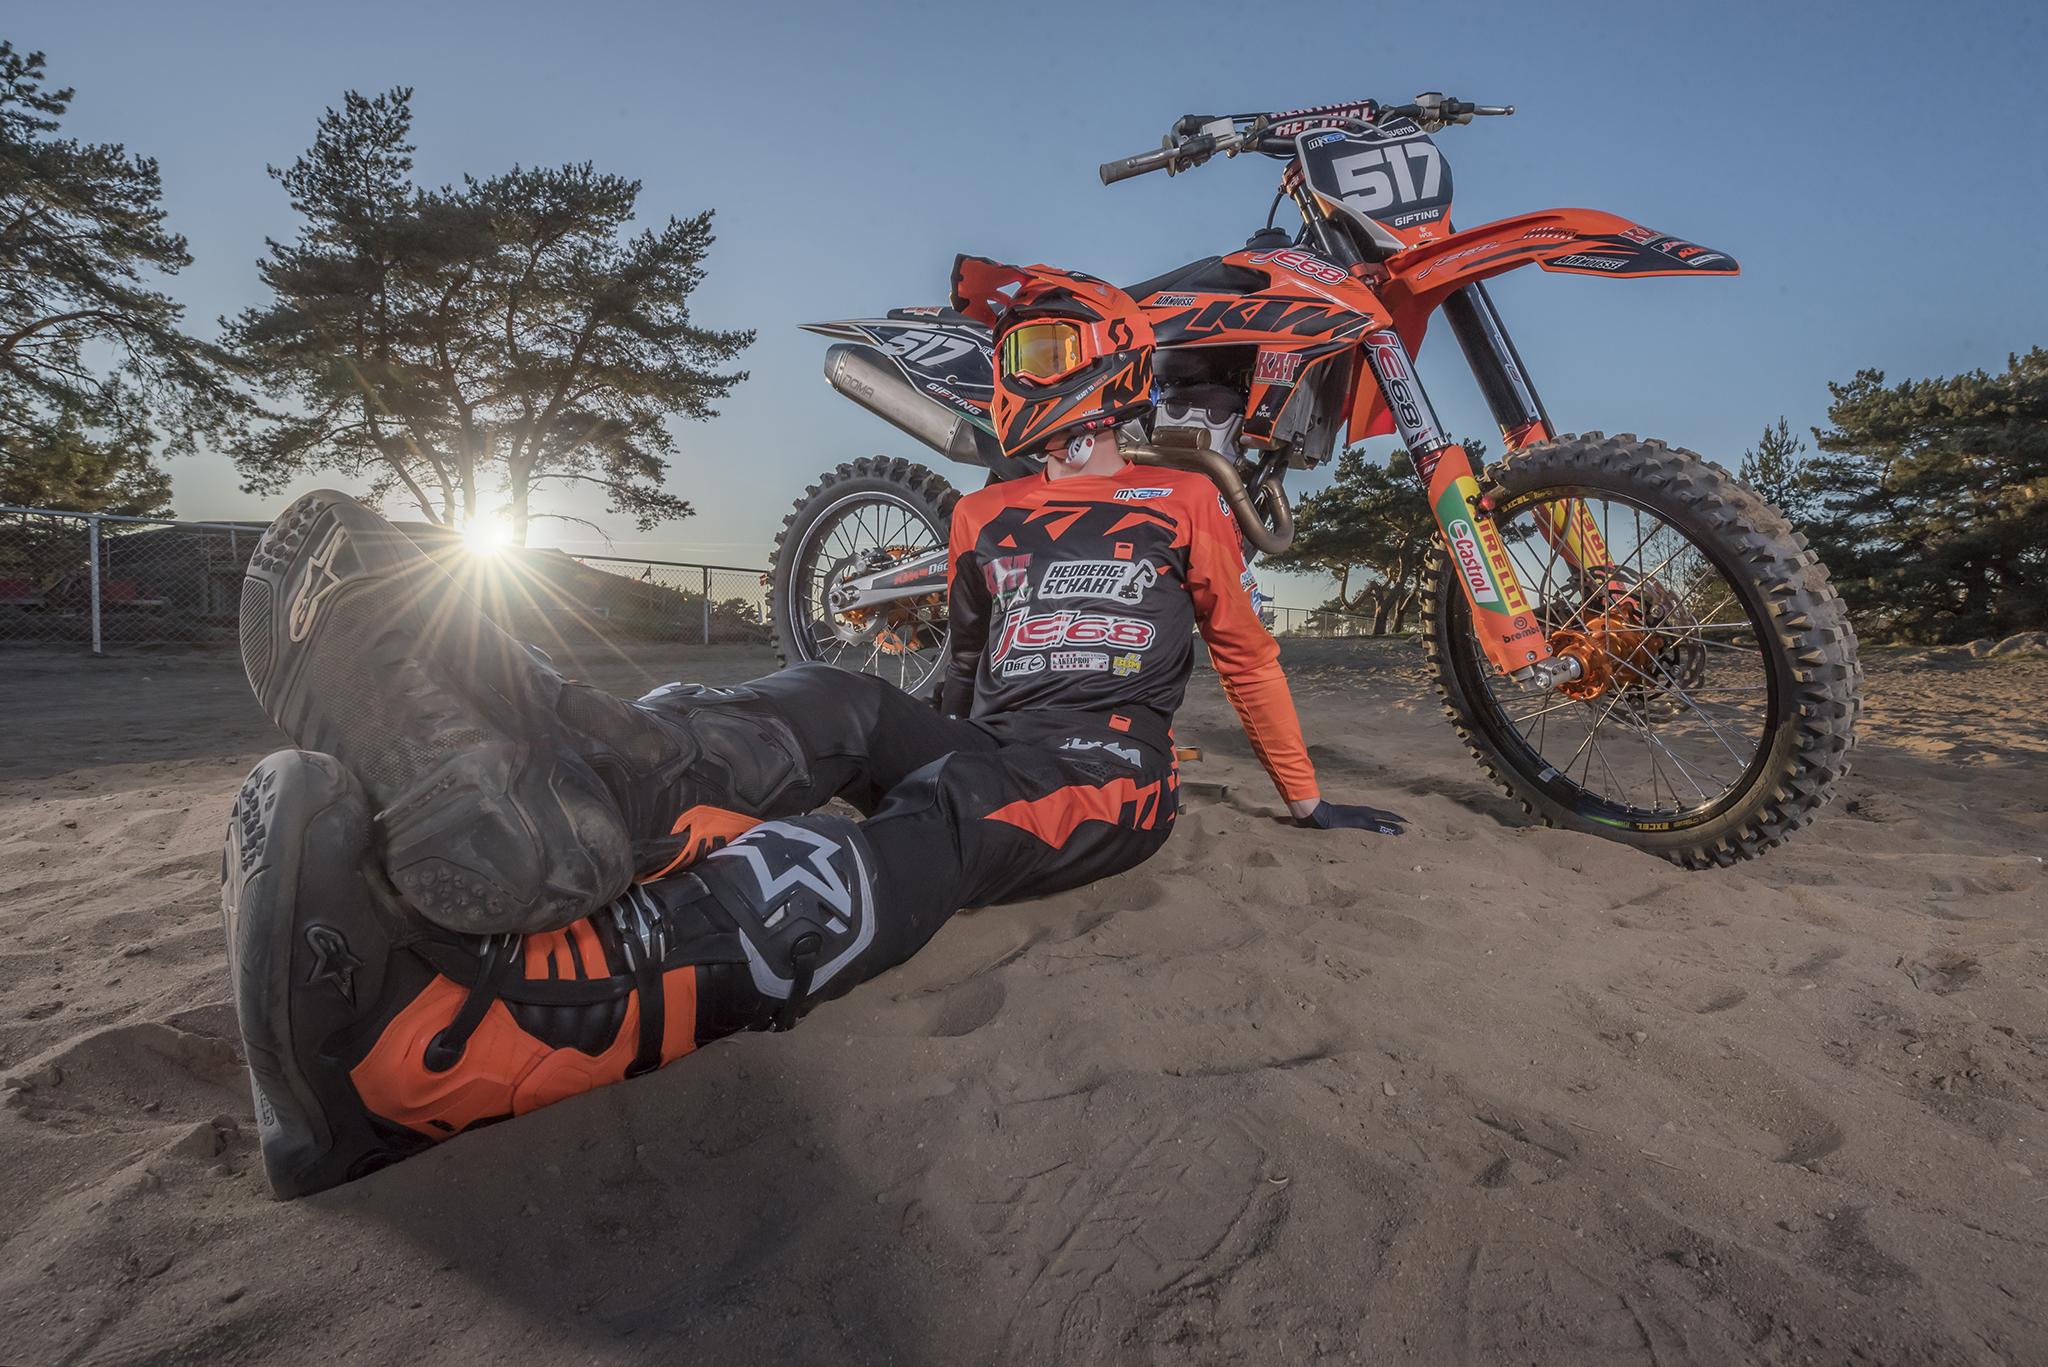 #photoshoot #mxsm #smcross #svemo #motocross #rodolfi #madebyrodolfi #danielrodolfi